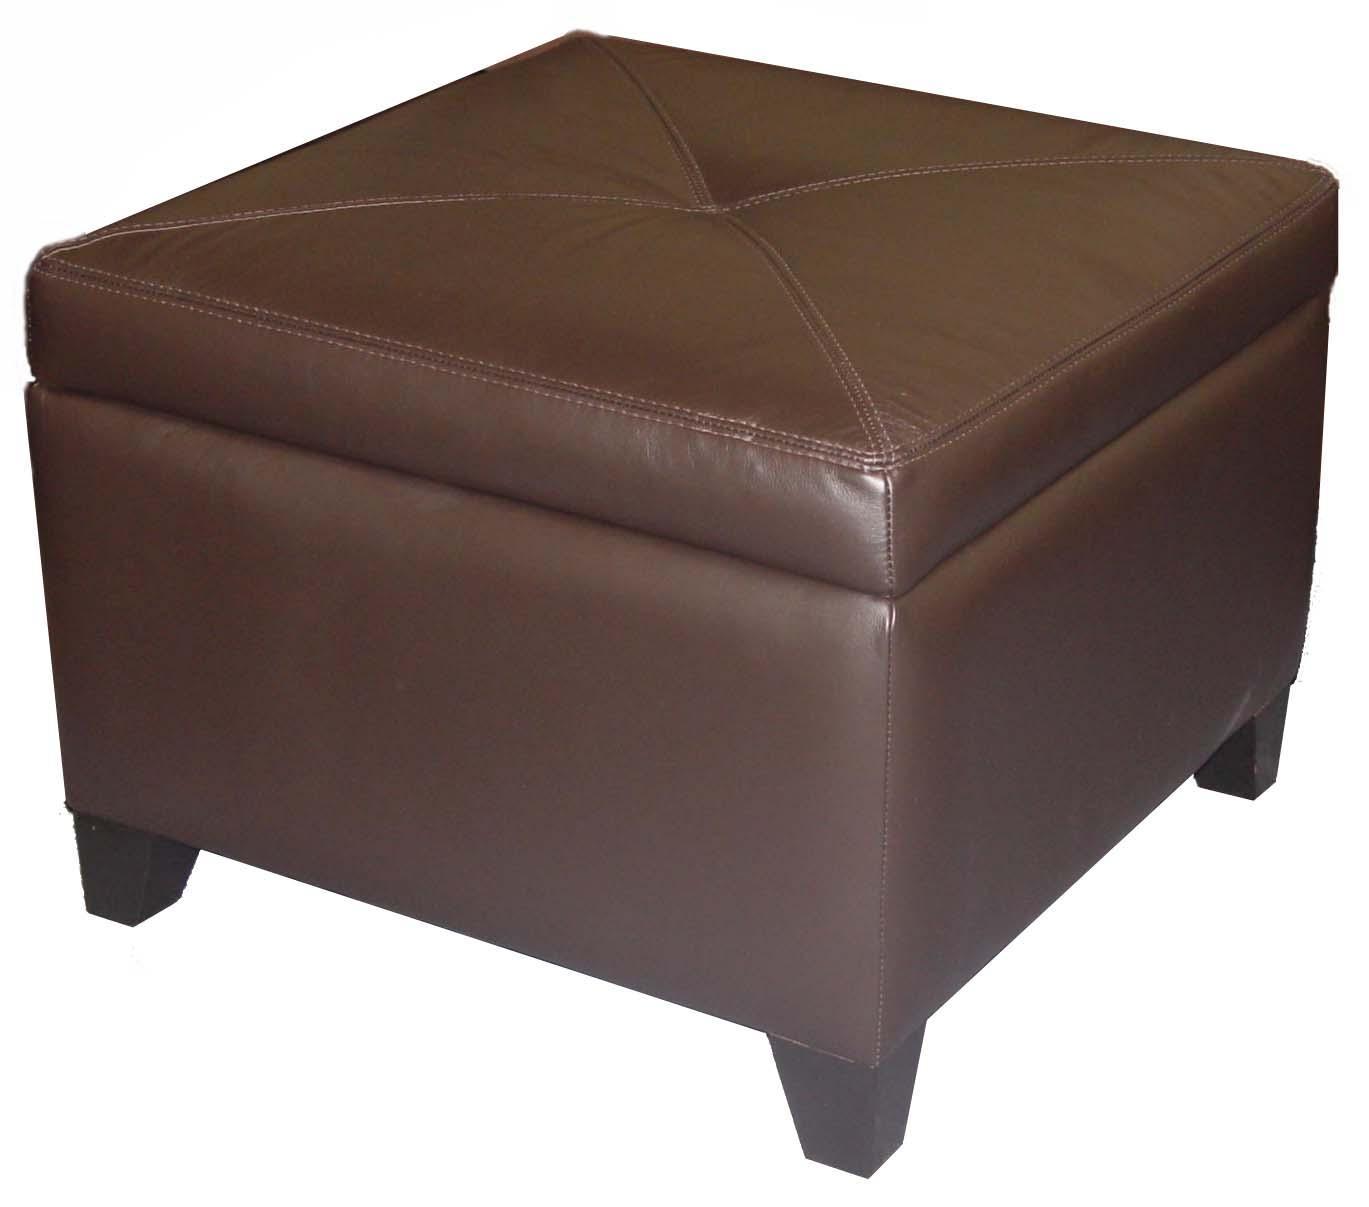 Accentuates Miles Leather Storage Ottoman at Williams & Kay